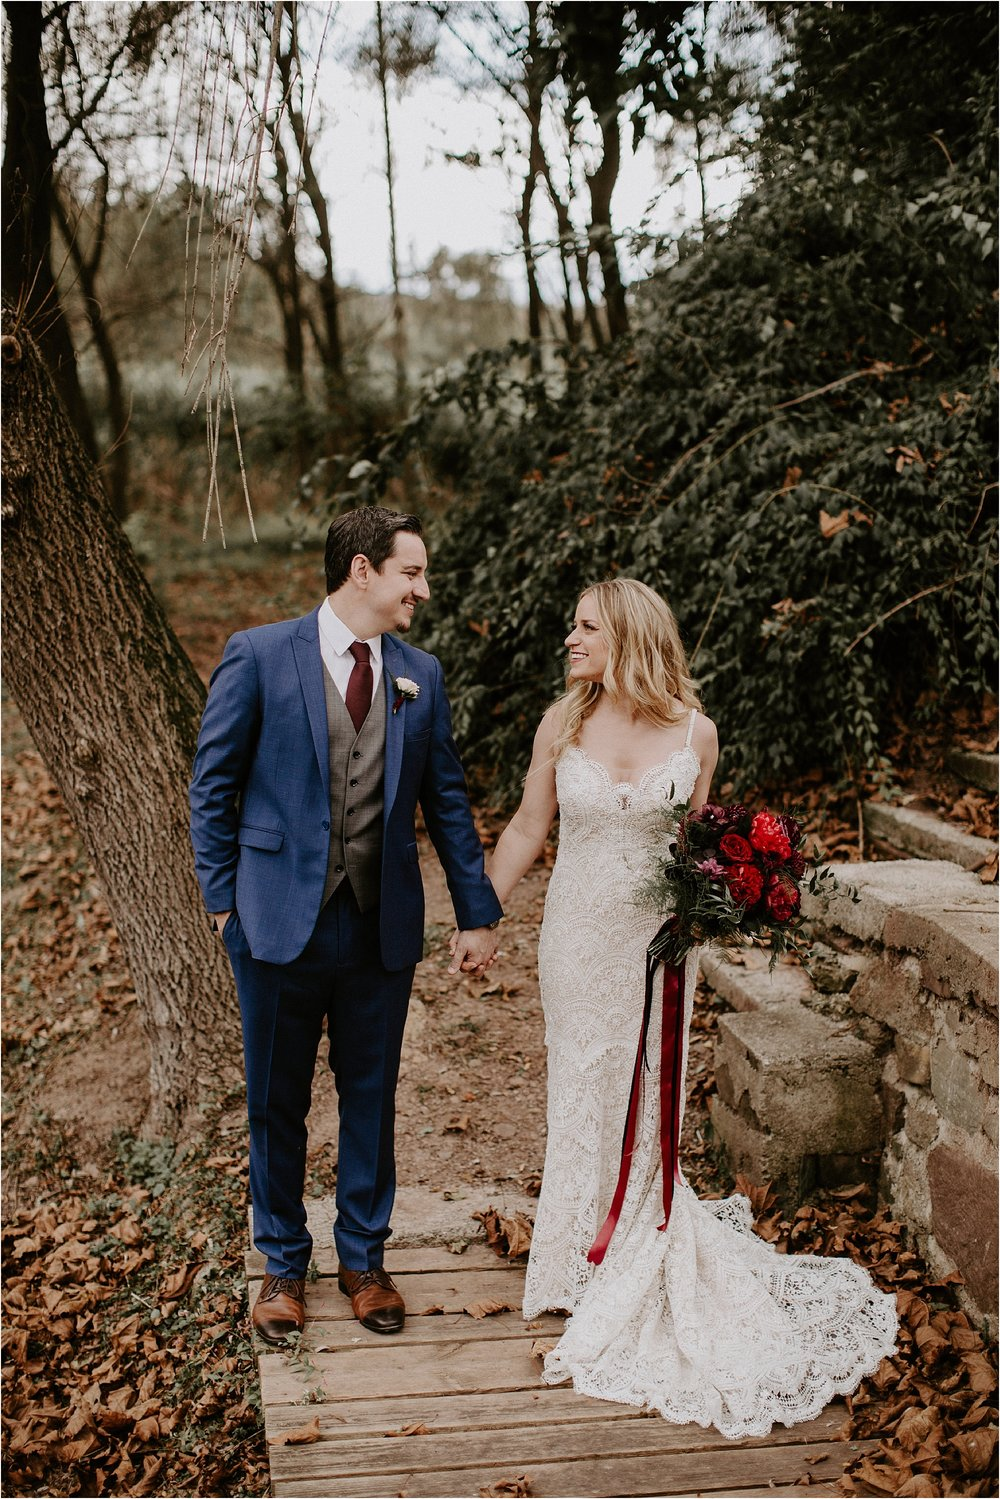 Sarah_Brookhart_Philadelphia_Wedding_Photographer_0030.jpg